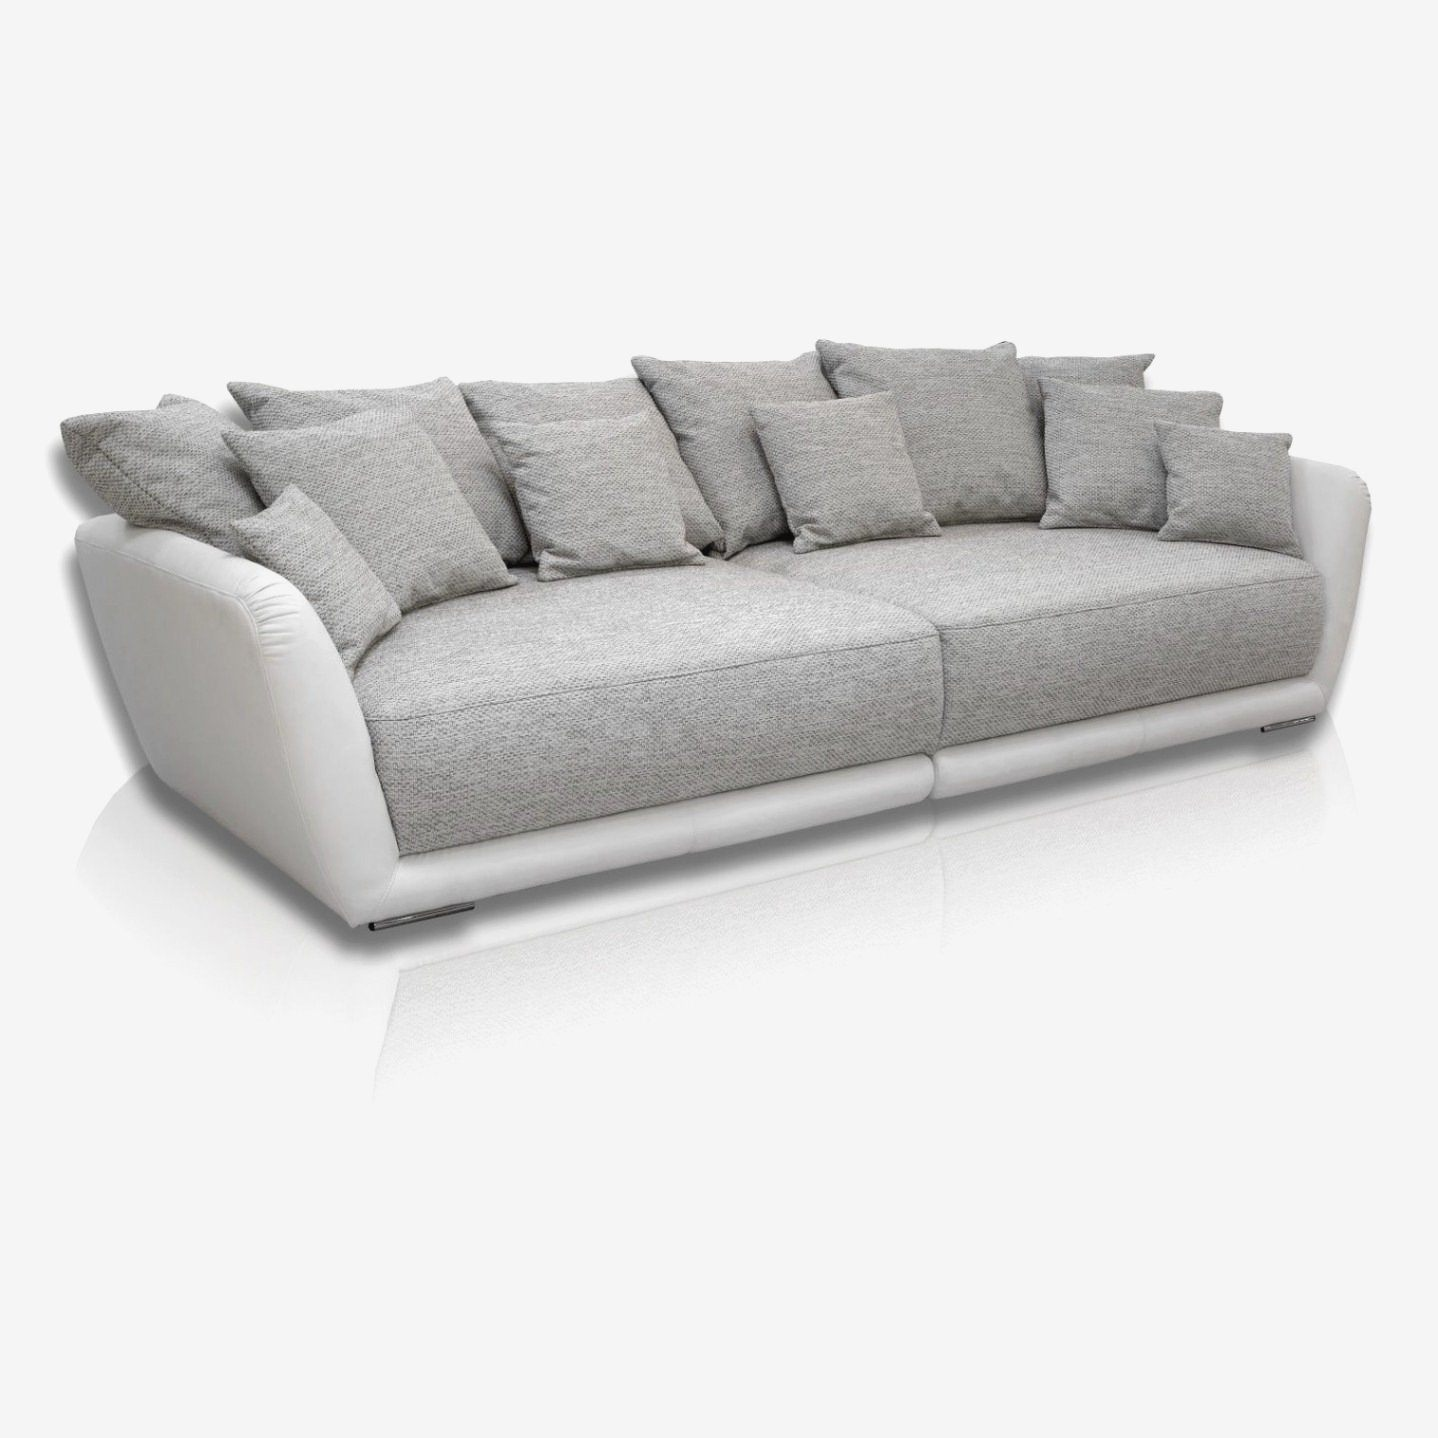 Lit King Size Ikea Impressionnant Futon sofa Bed